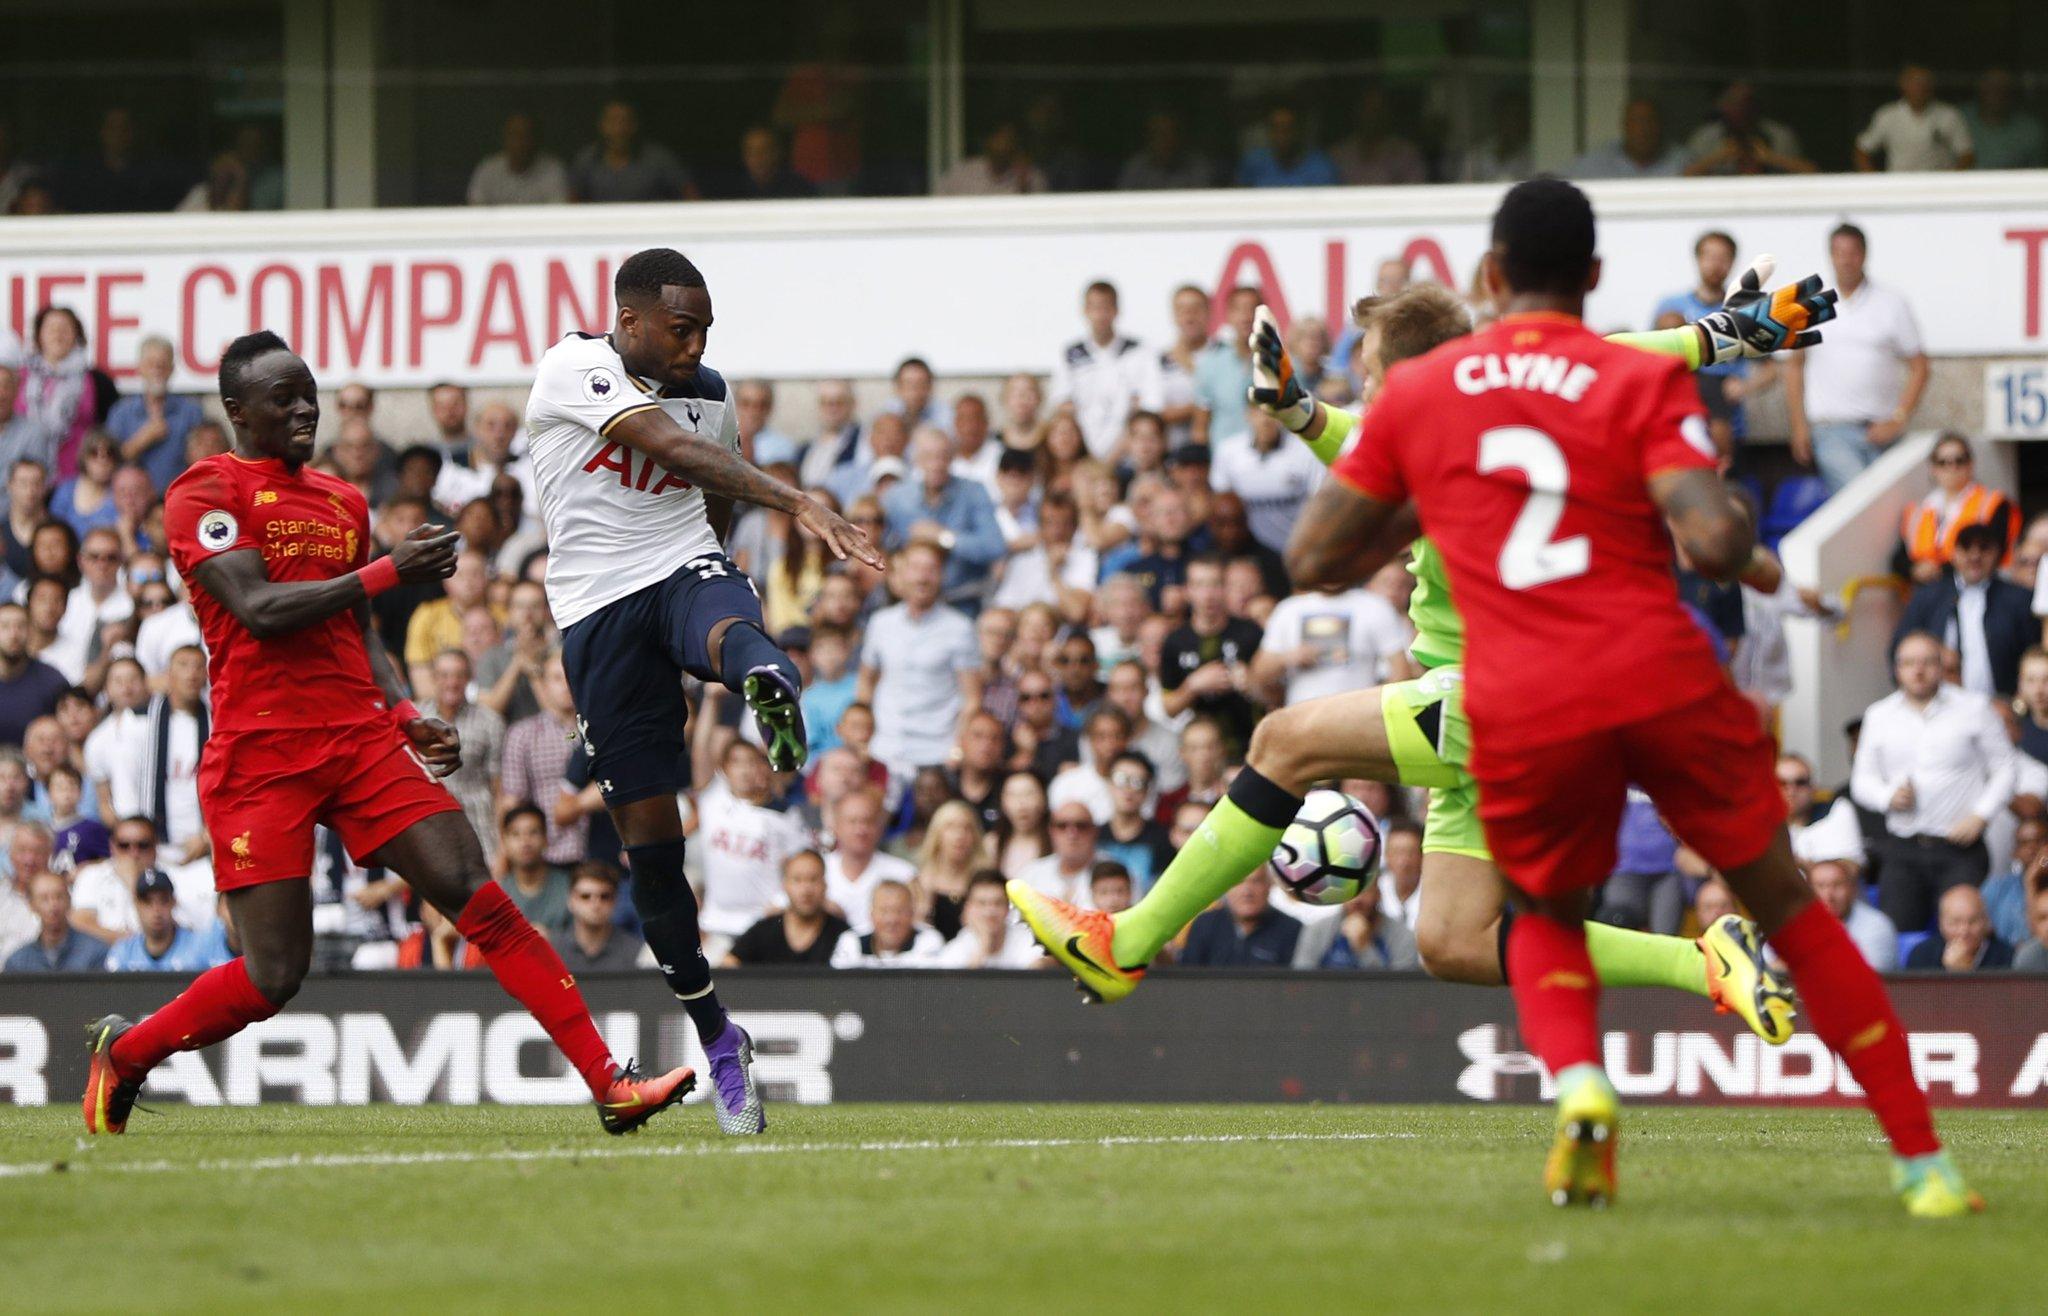 Milner, Rose Score As Tottenham, Liverpool Draw